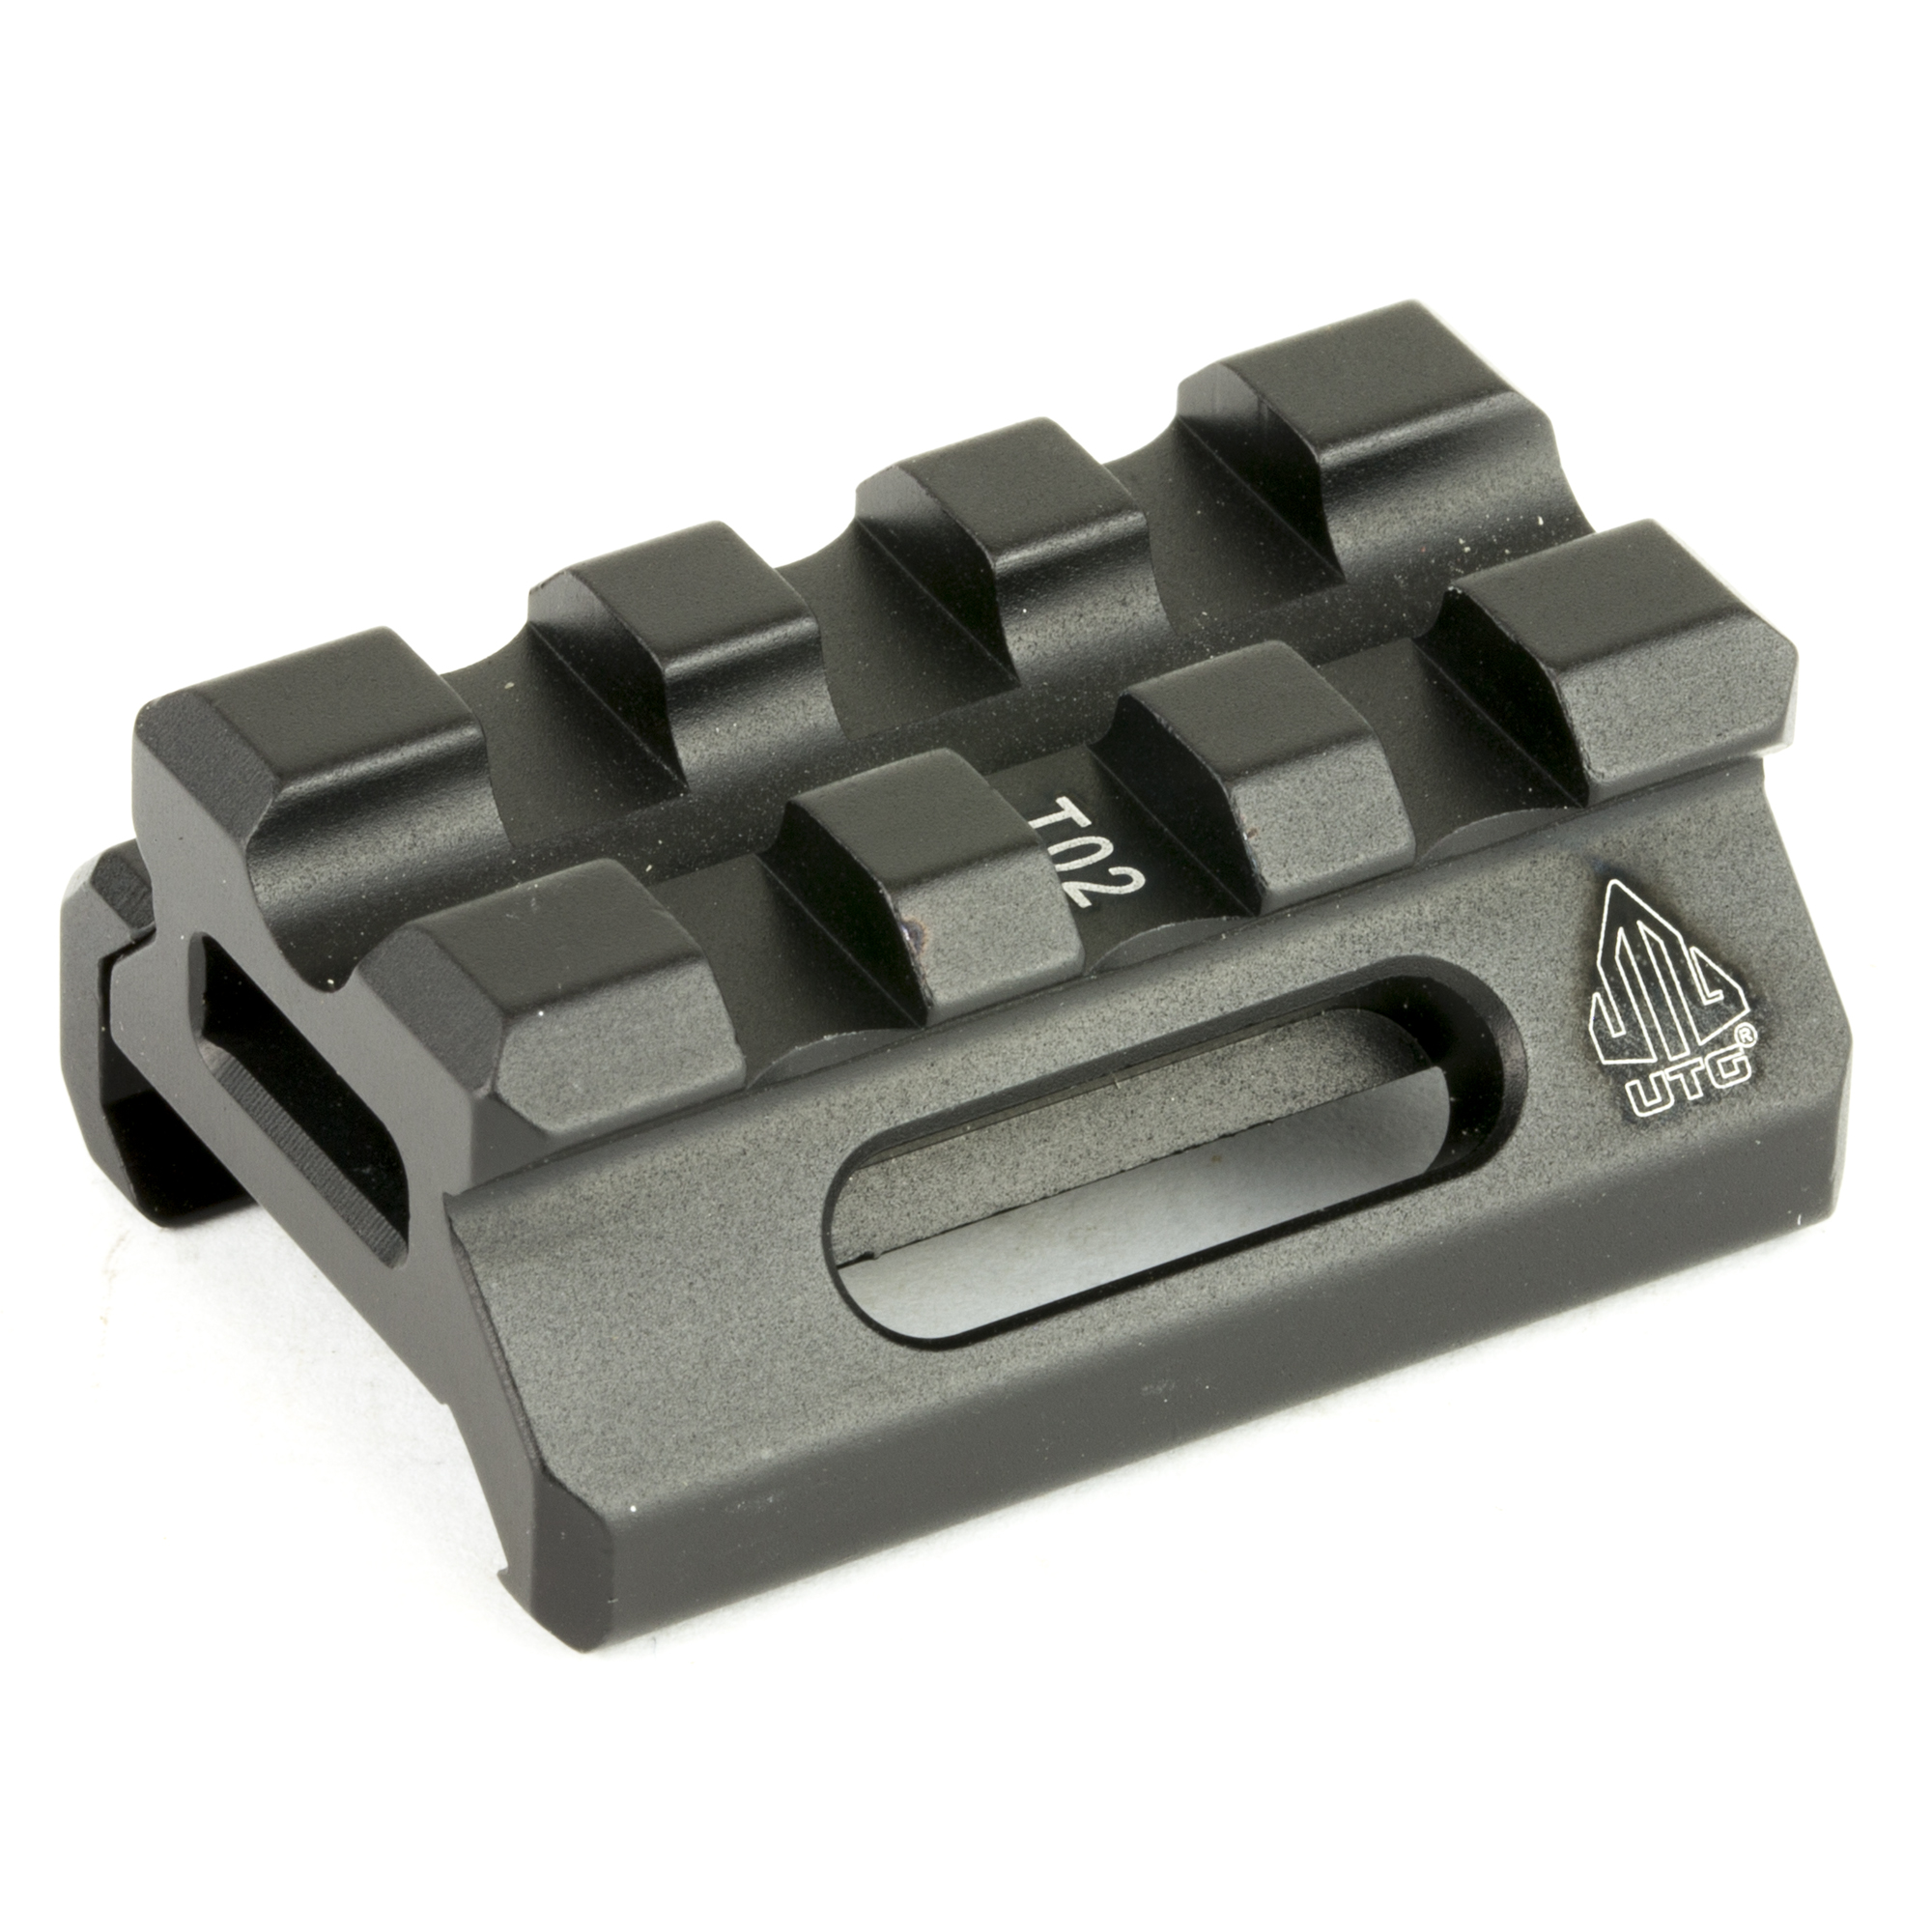 Leapers UTG Super Slim Picatinny Riser Mount - MSR Arms